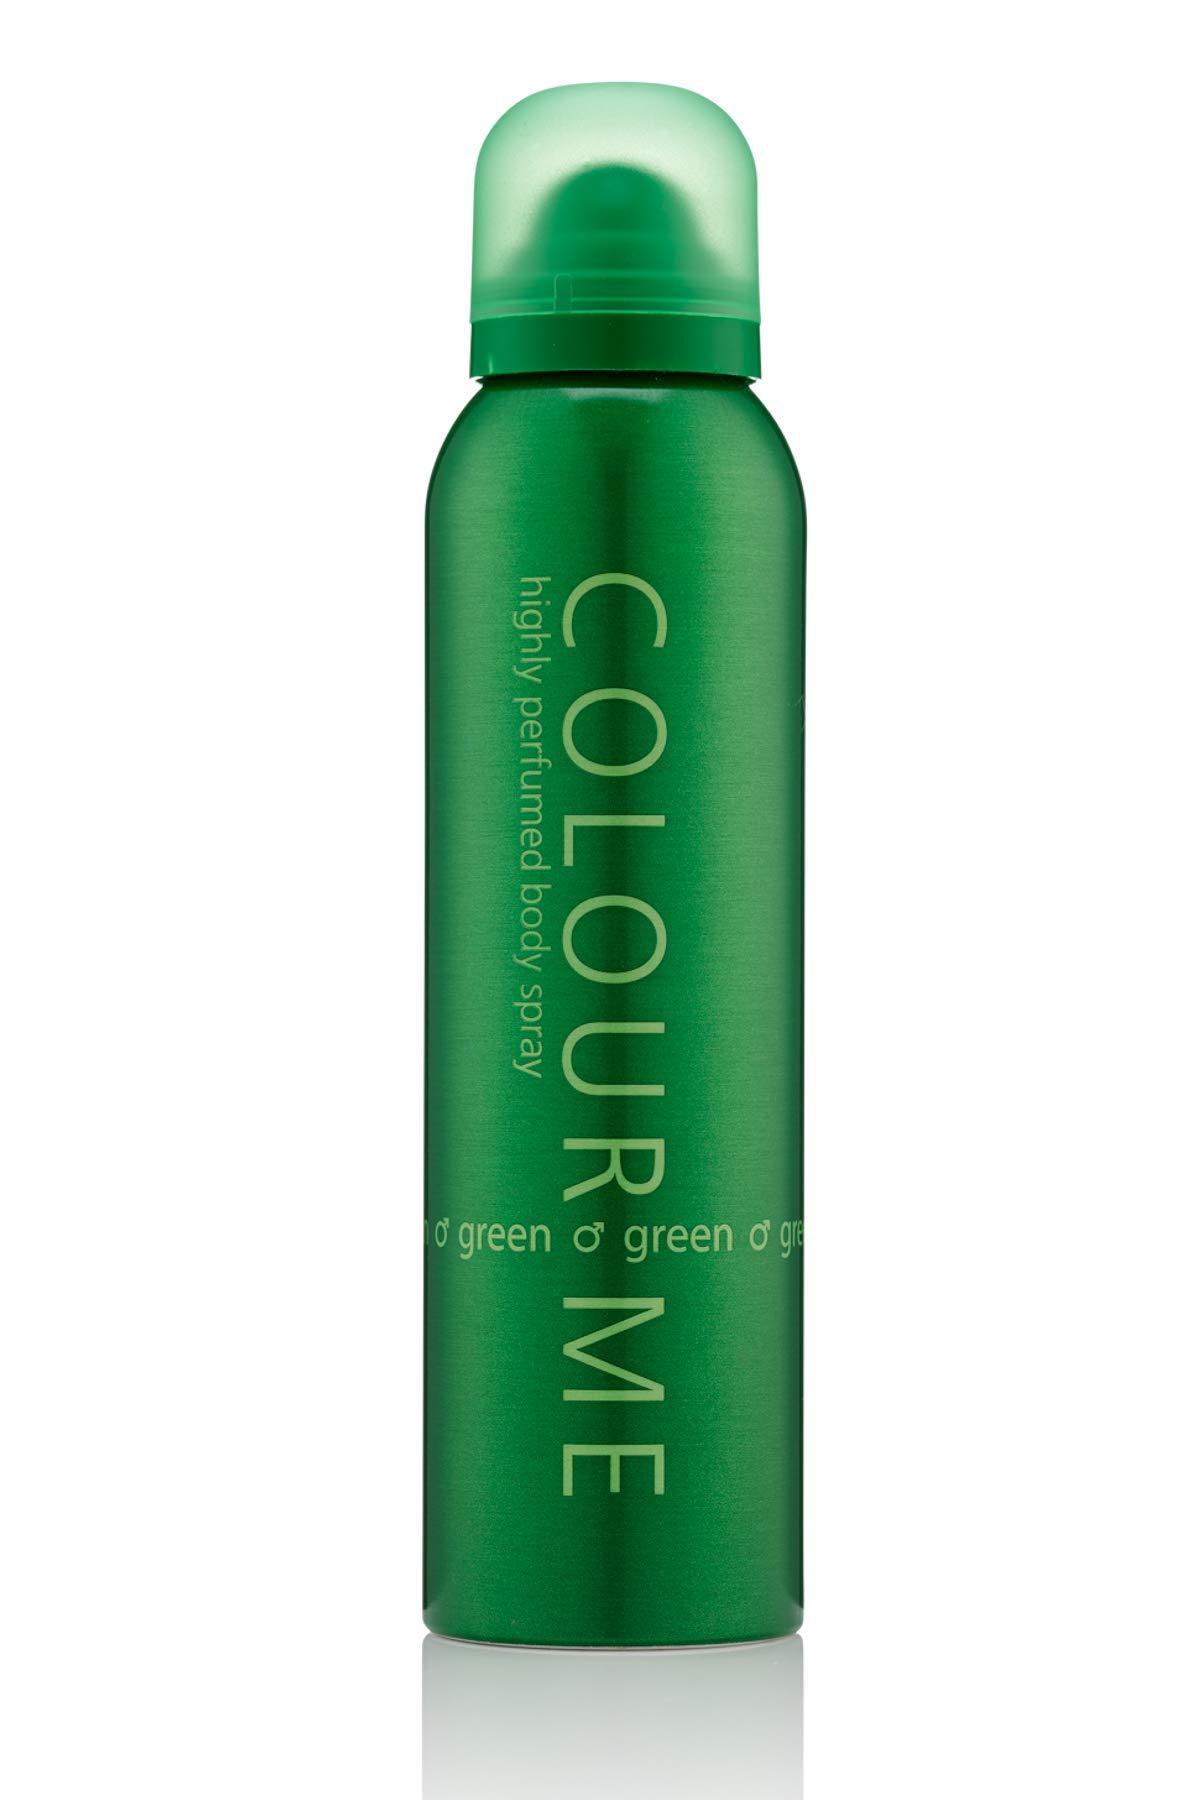 Colour Me | Green | Body Spray | Fragrance for Men | Oriental Fougere Scent | 5.1 oz